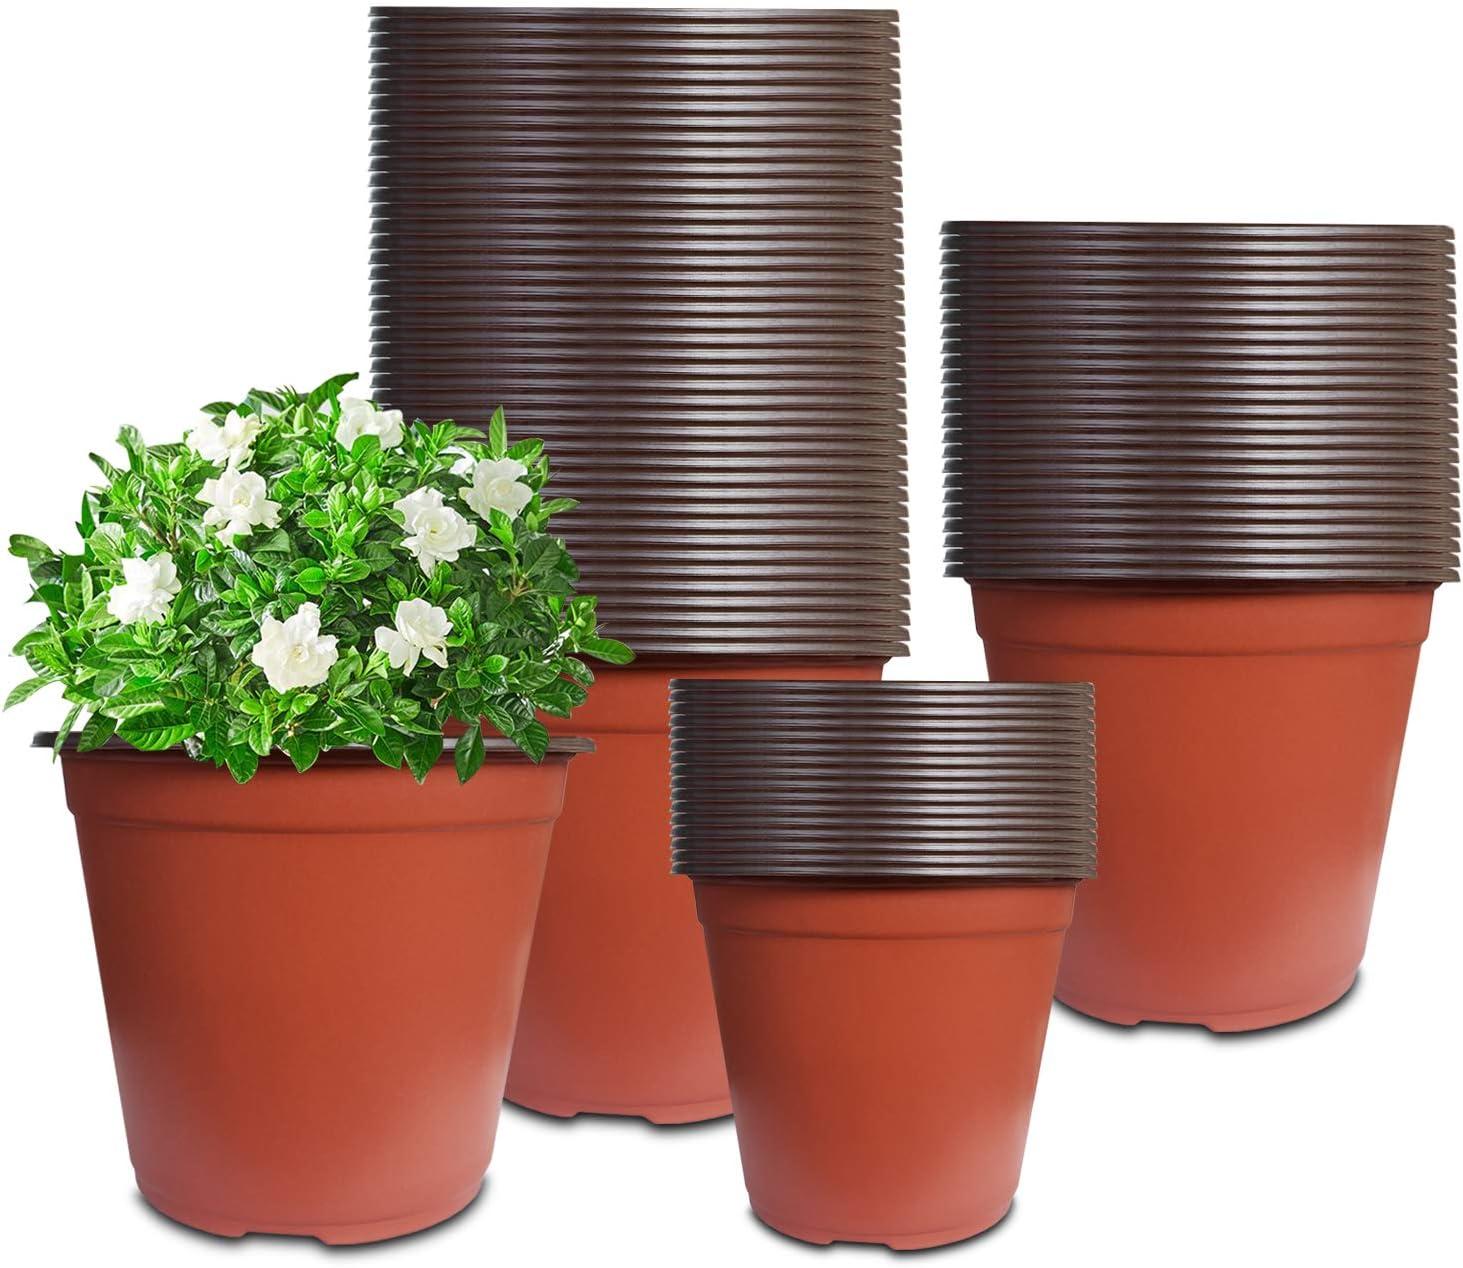 80 Pcs 6 Inch Plastic Seedlings Plants Nursery Pots, Seed Starting Planter Nursery Pots Suitable for Indoor, Outdoor, Garden,Yard and Park